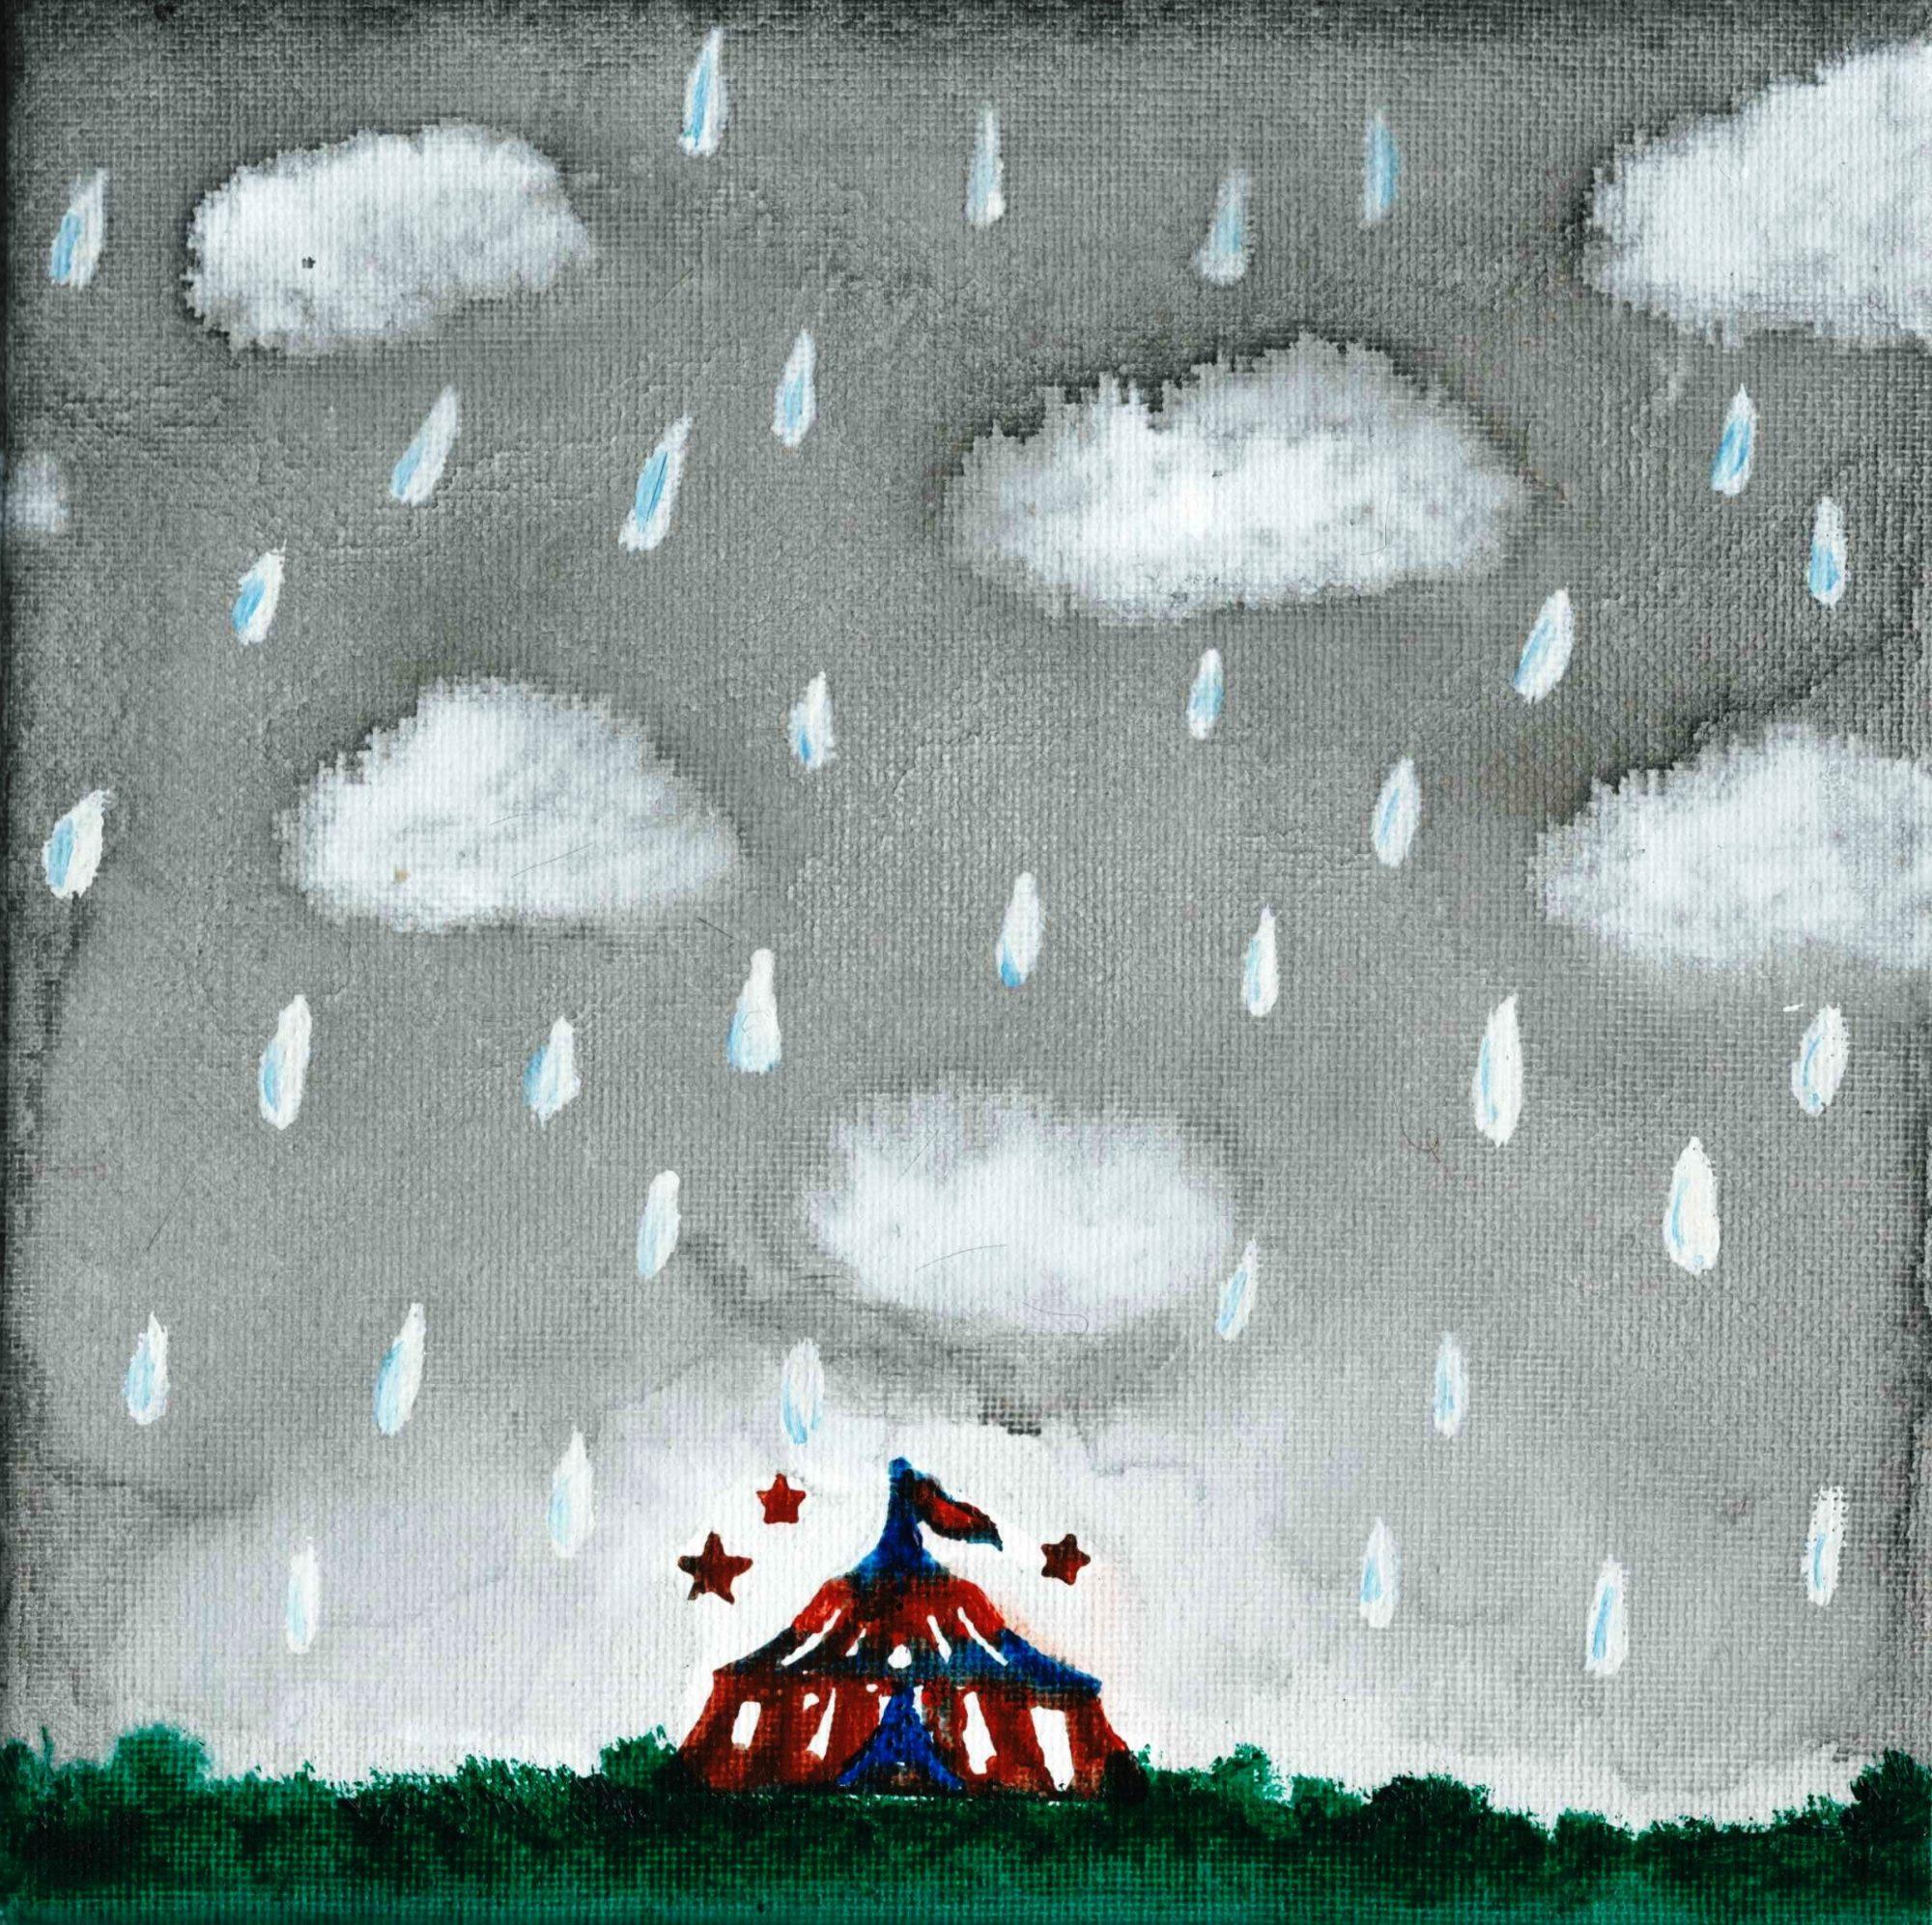 raining-day